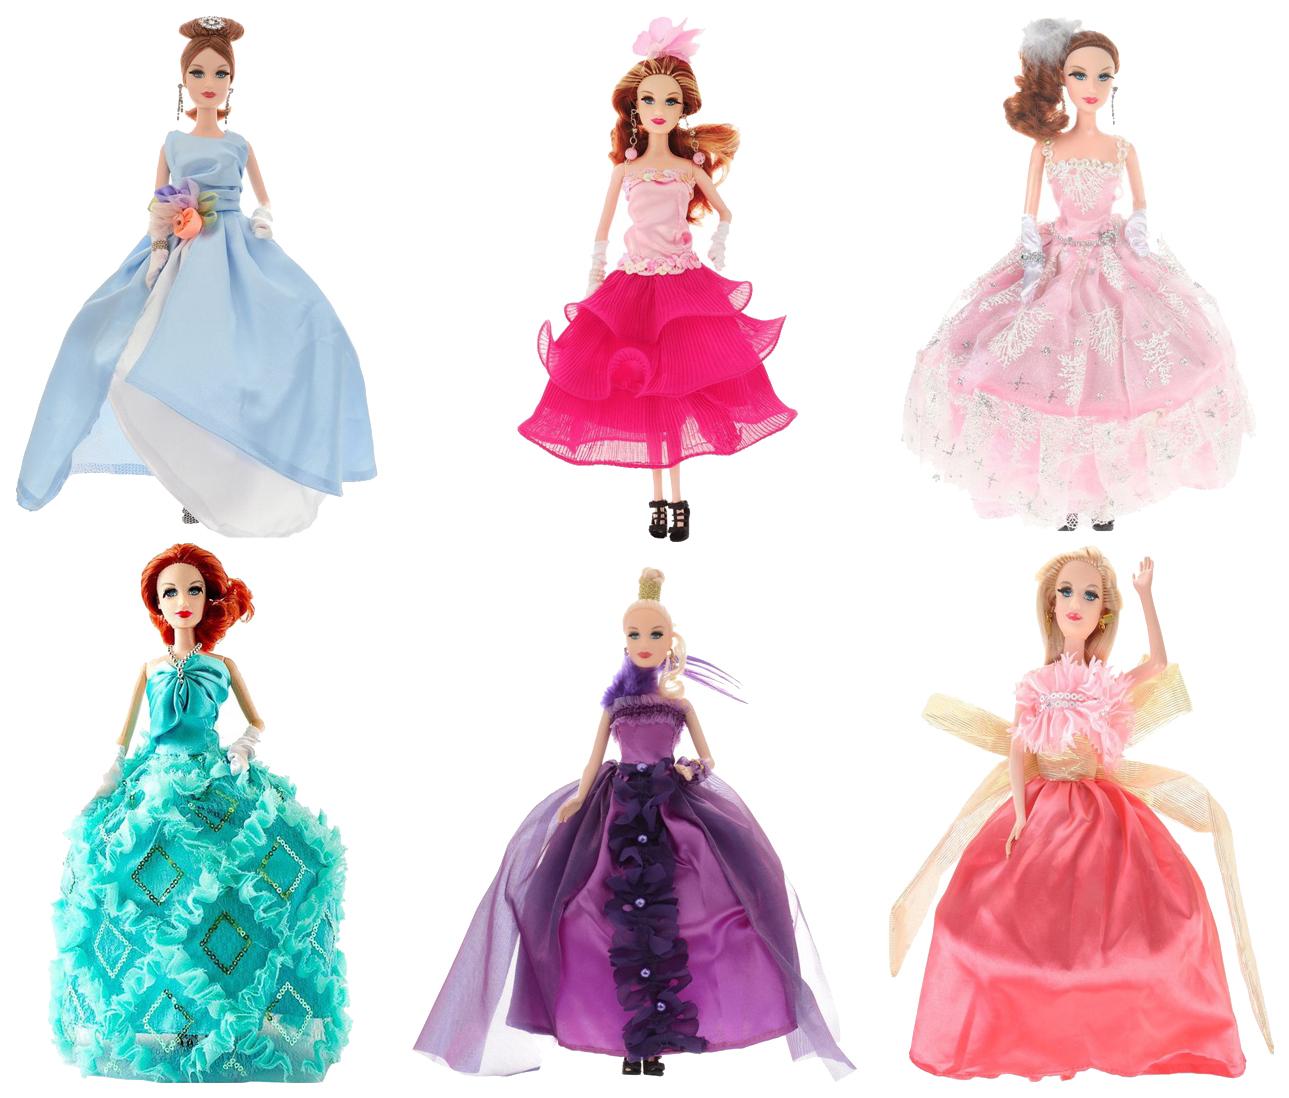 Кукла ABtoys Весенний вальс Королева бала PT-00441 30 см